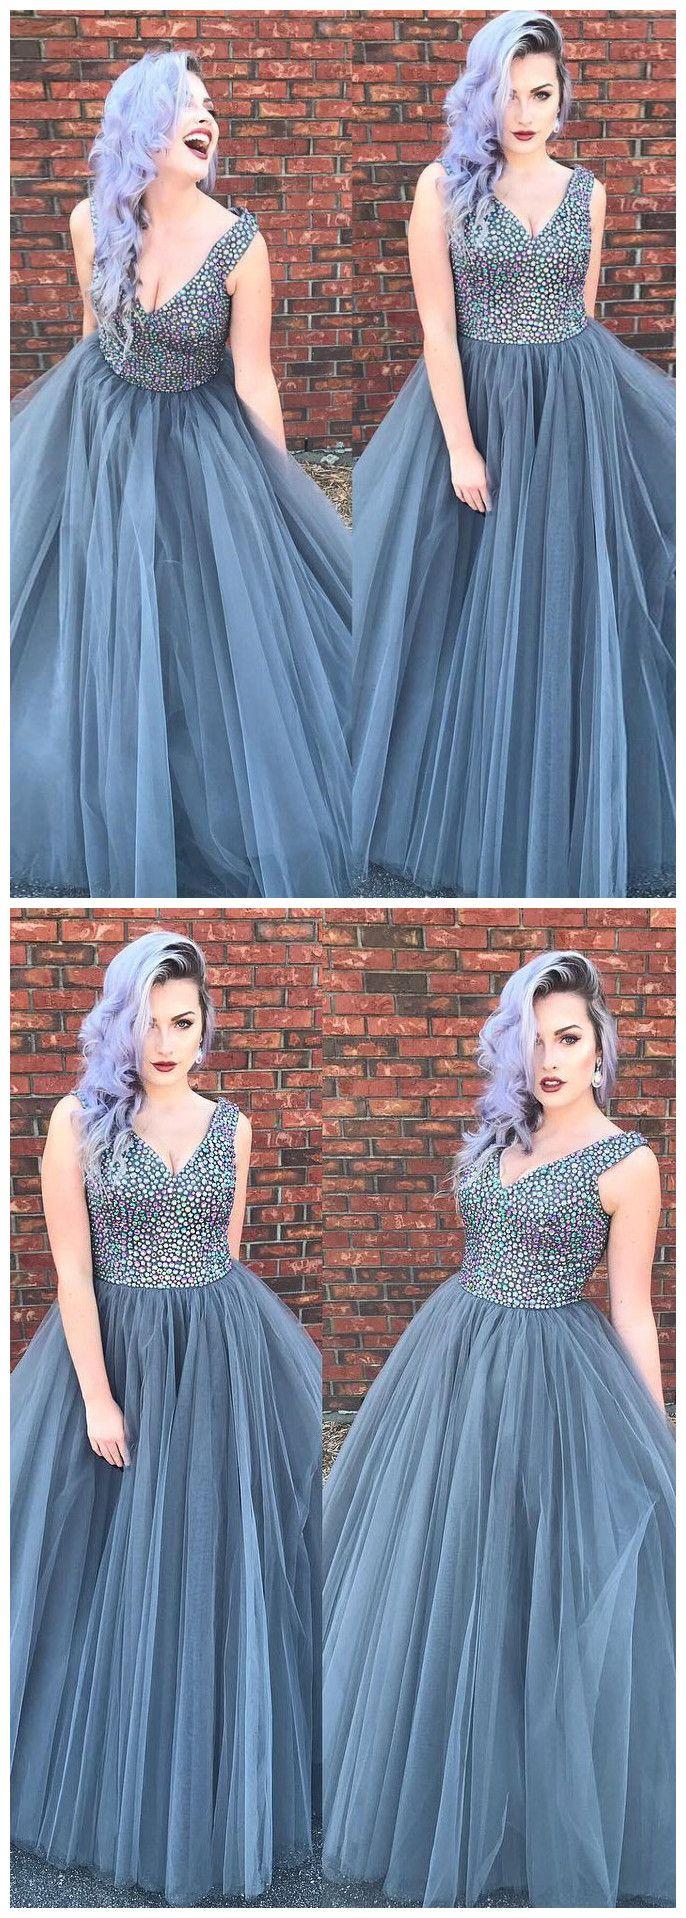 Silver prom dresses aline v neck rhinestone modest long prom dress